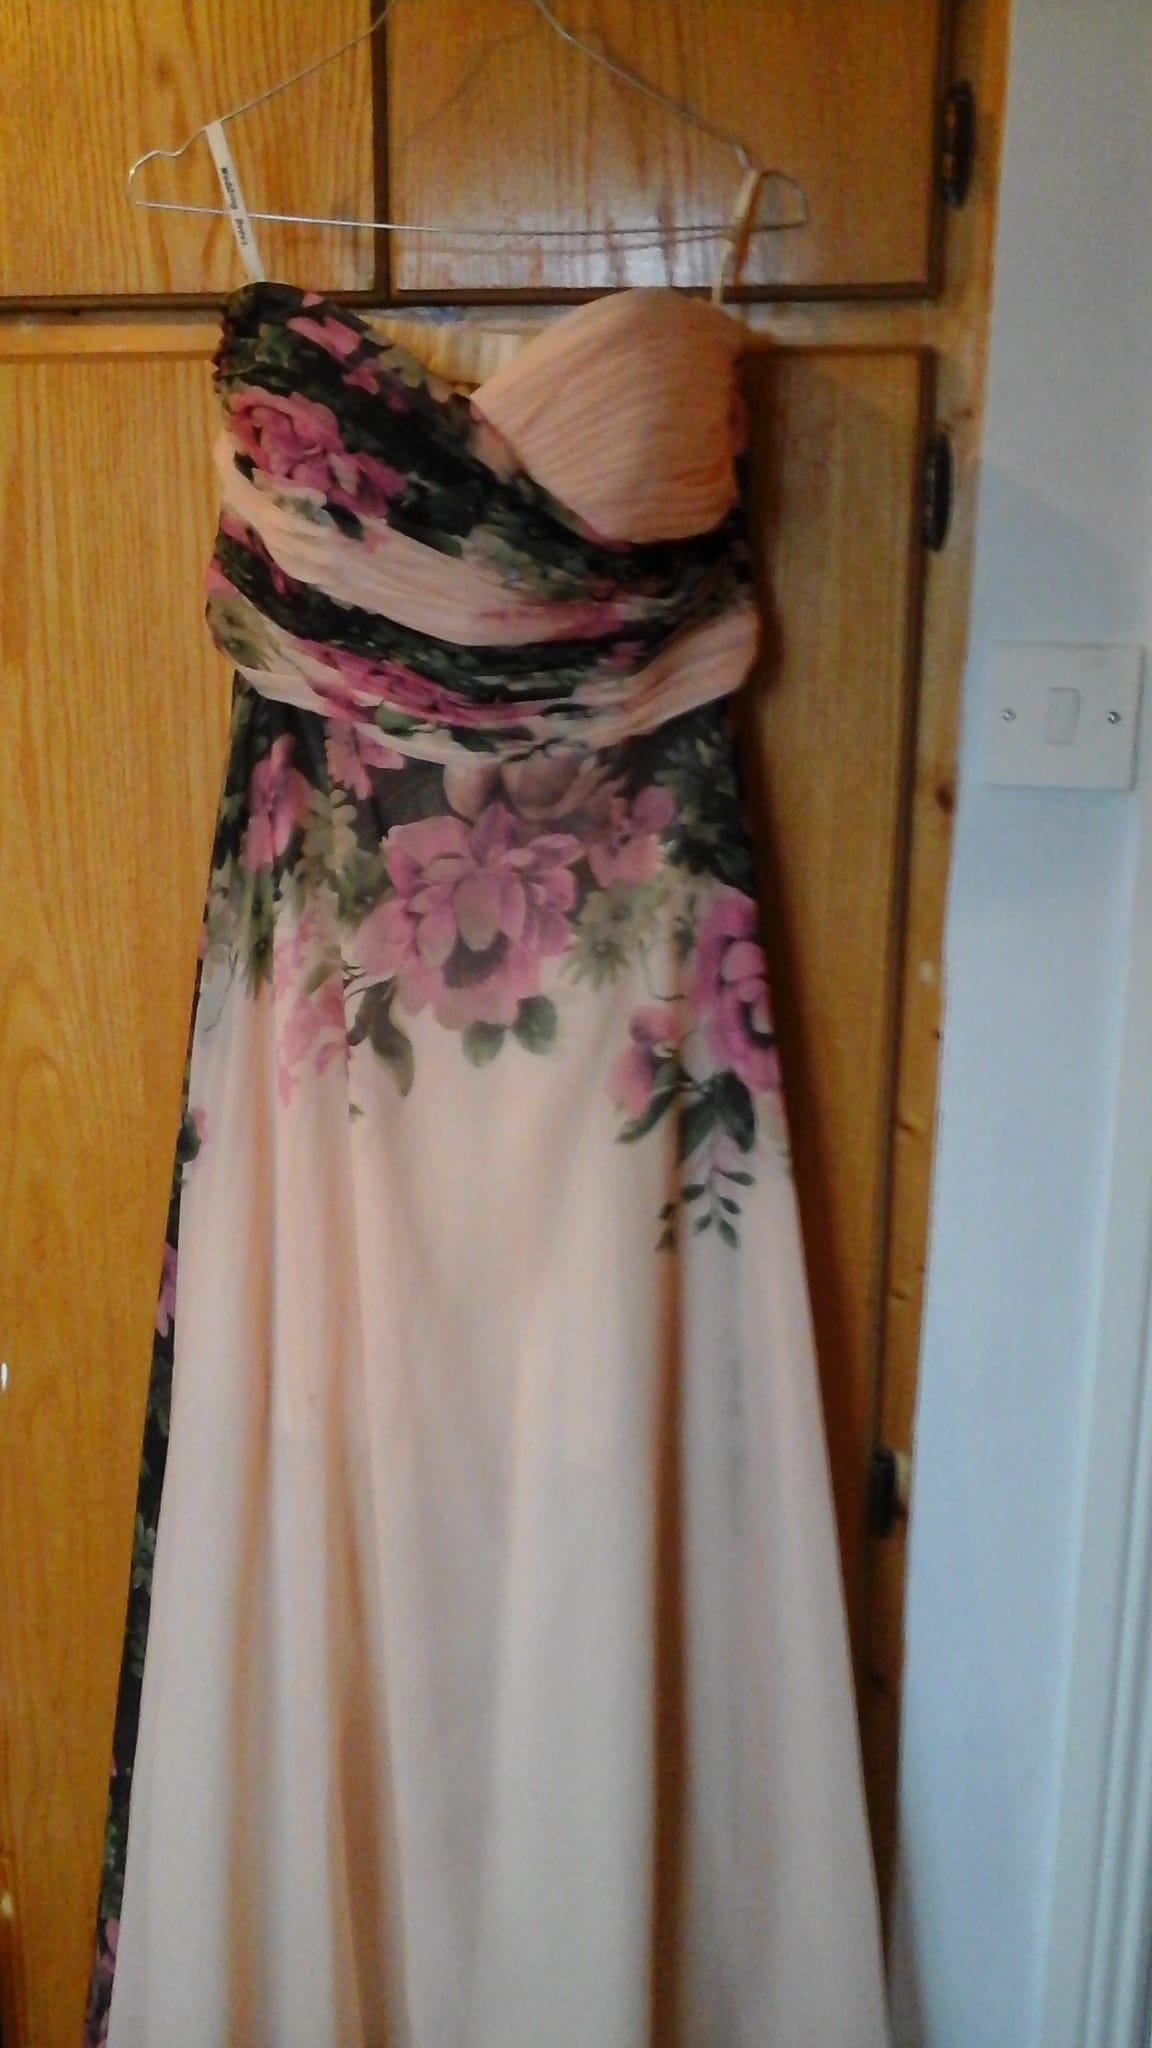 2 x floral bridesmaid dresses sell my wedding dress for How do i sell my wedding dress